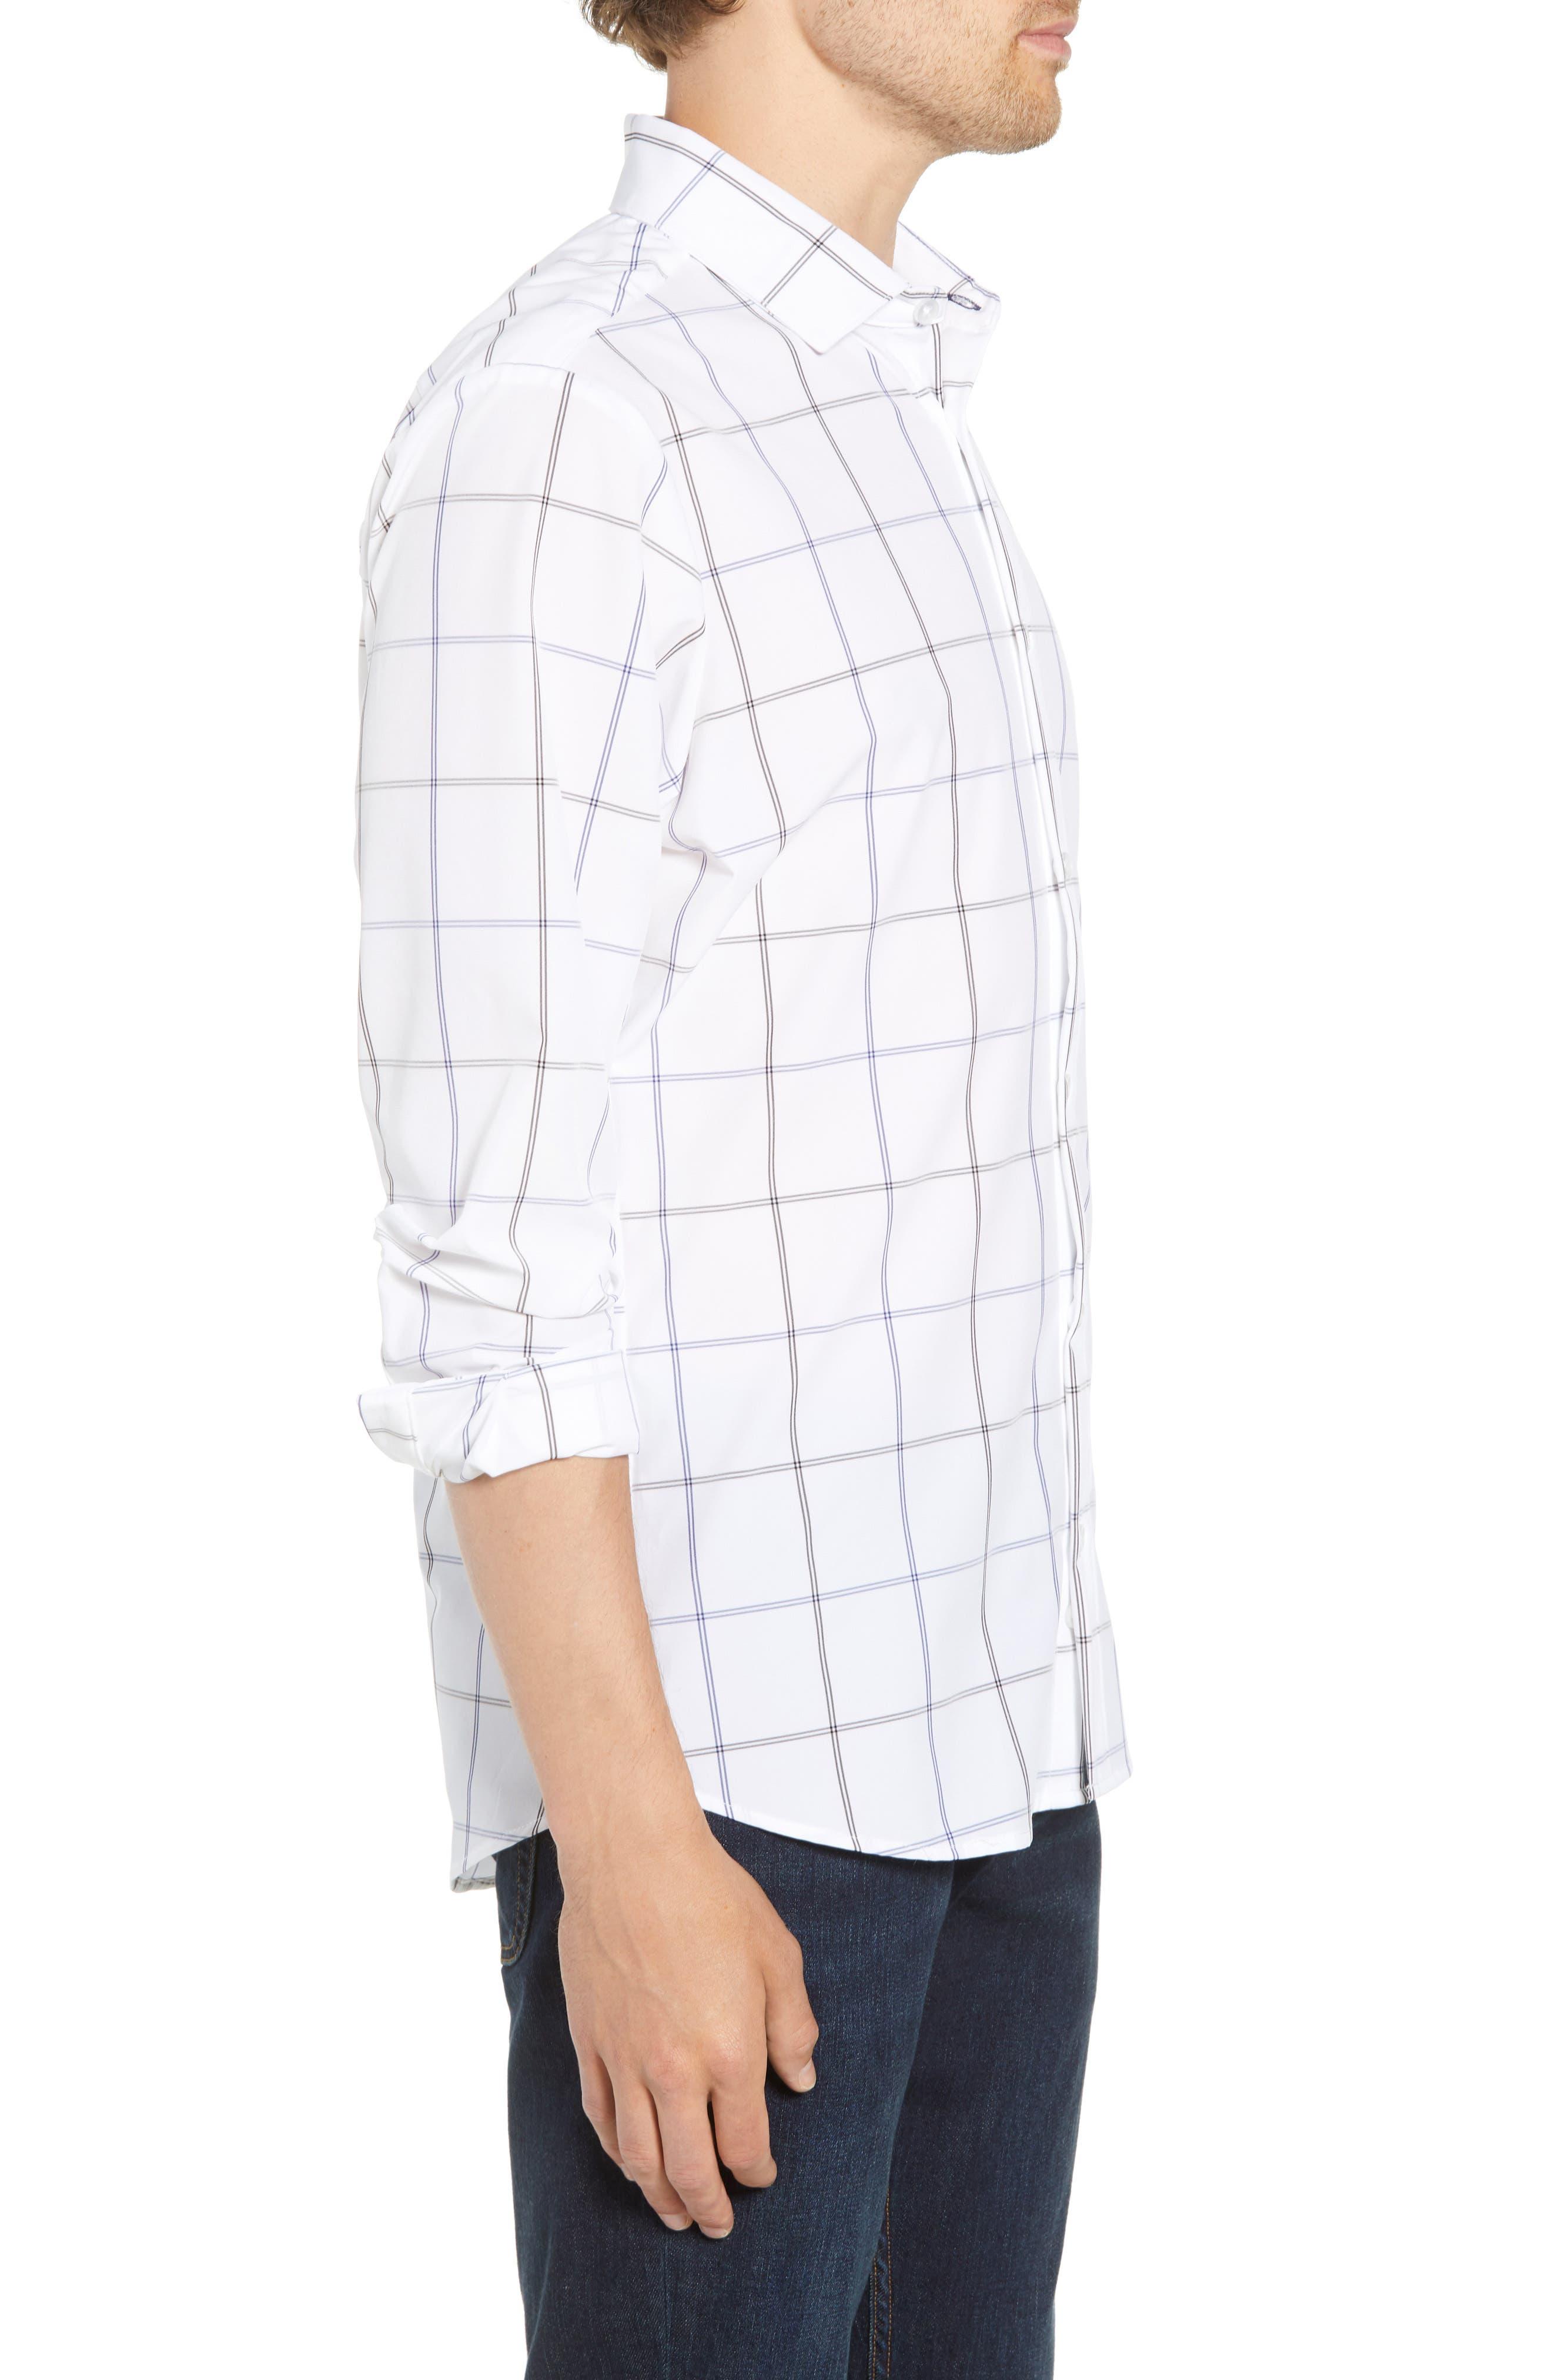 Crossman Slim Fit Grid Performance Sport Shirt,                             Alternate thumbnail 4, color,                             White